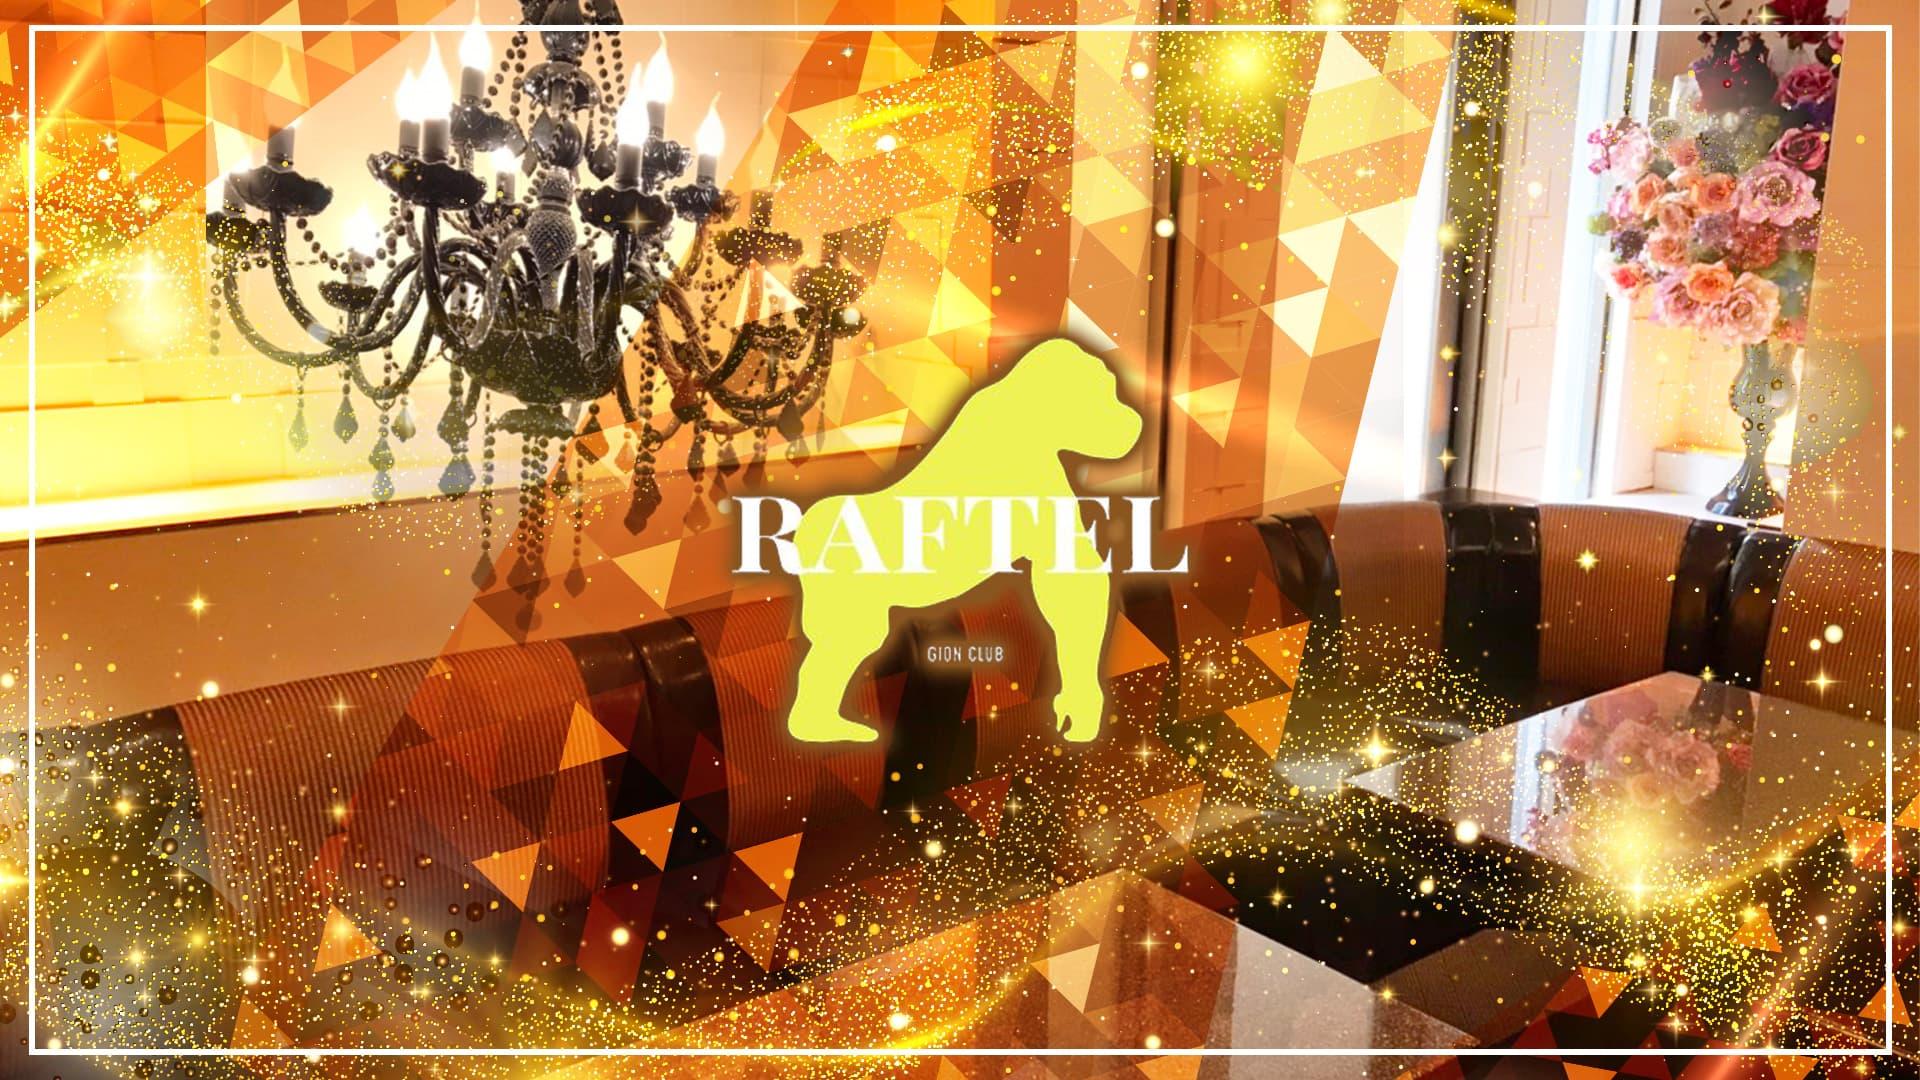 CLUB RAFTEL(ラフテル)【公式求人・体入情報】 祇園キャバクラ TOP画像